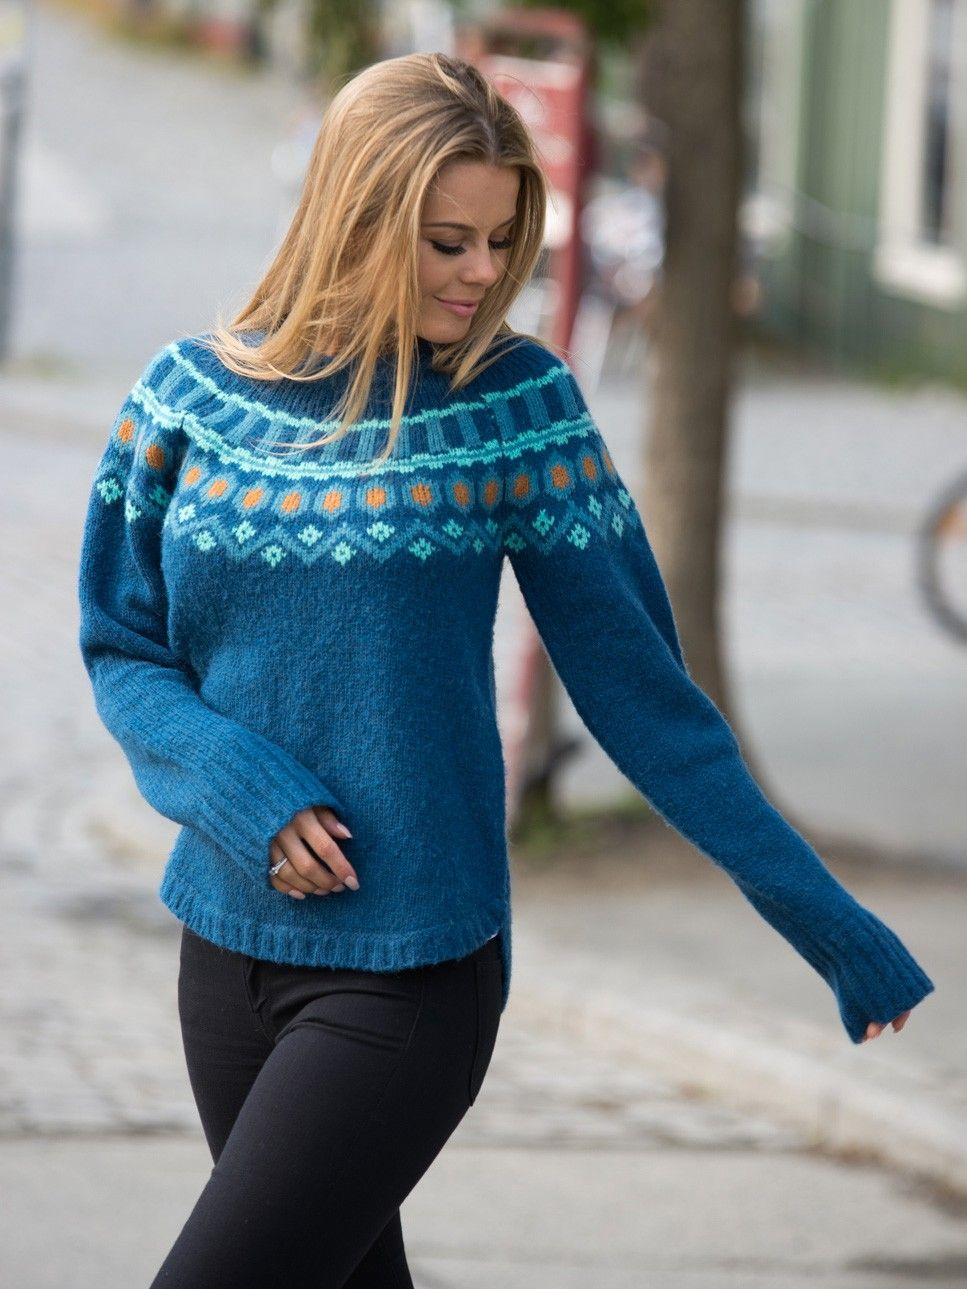 Kari traa genser